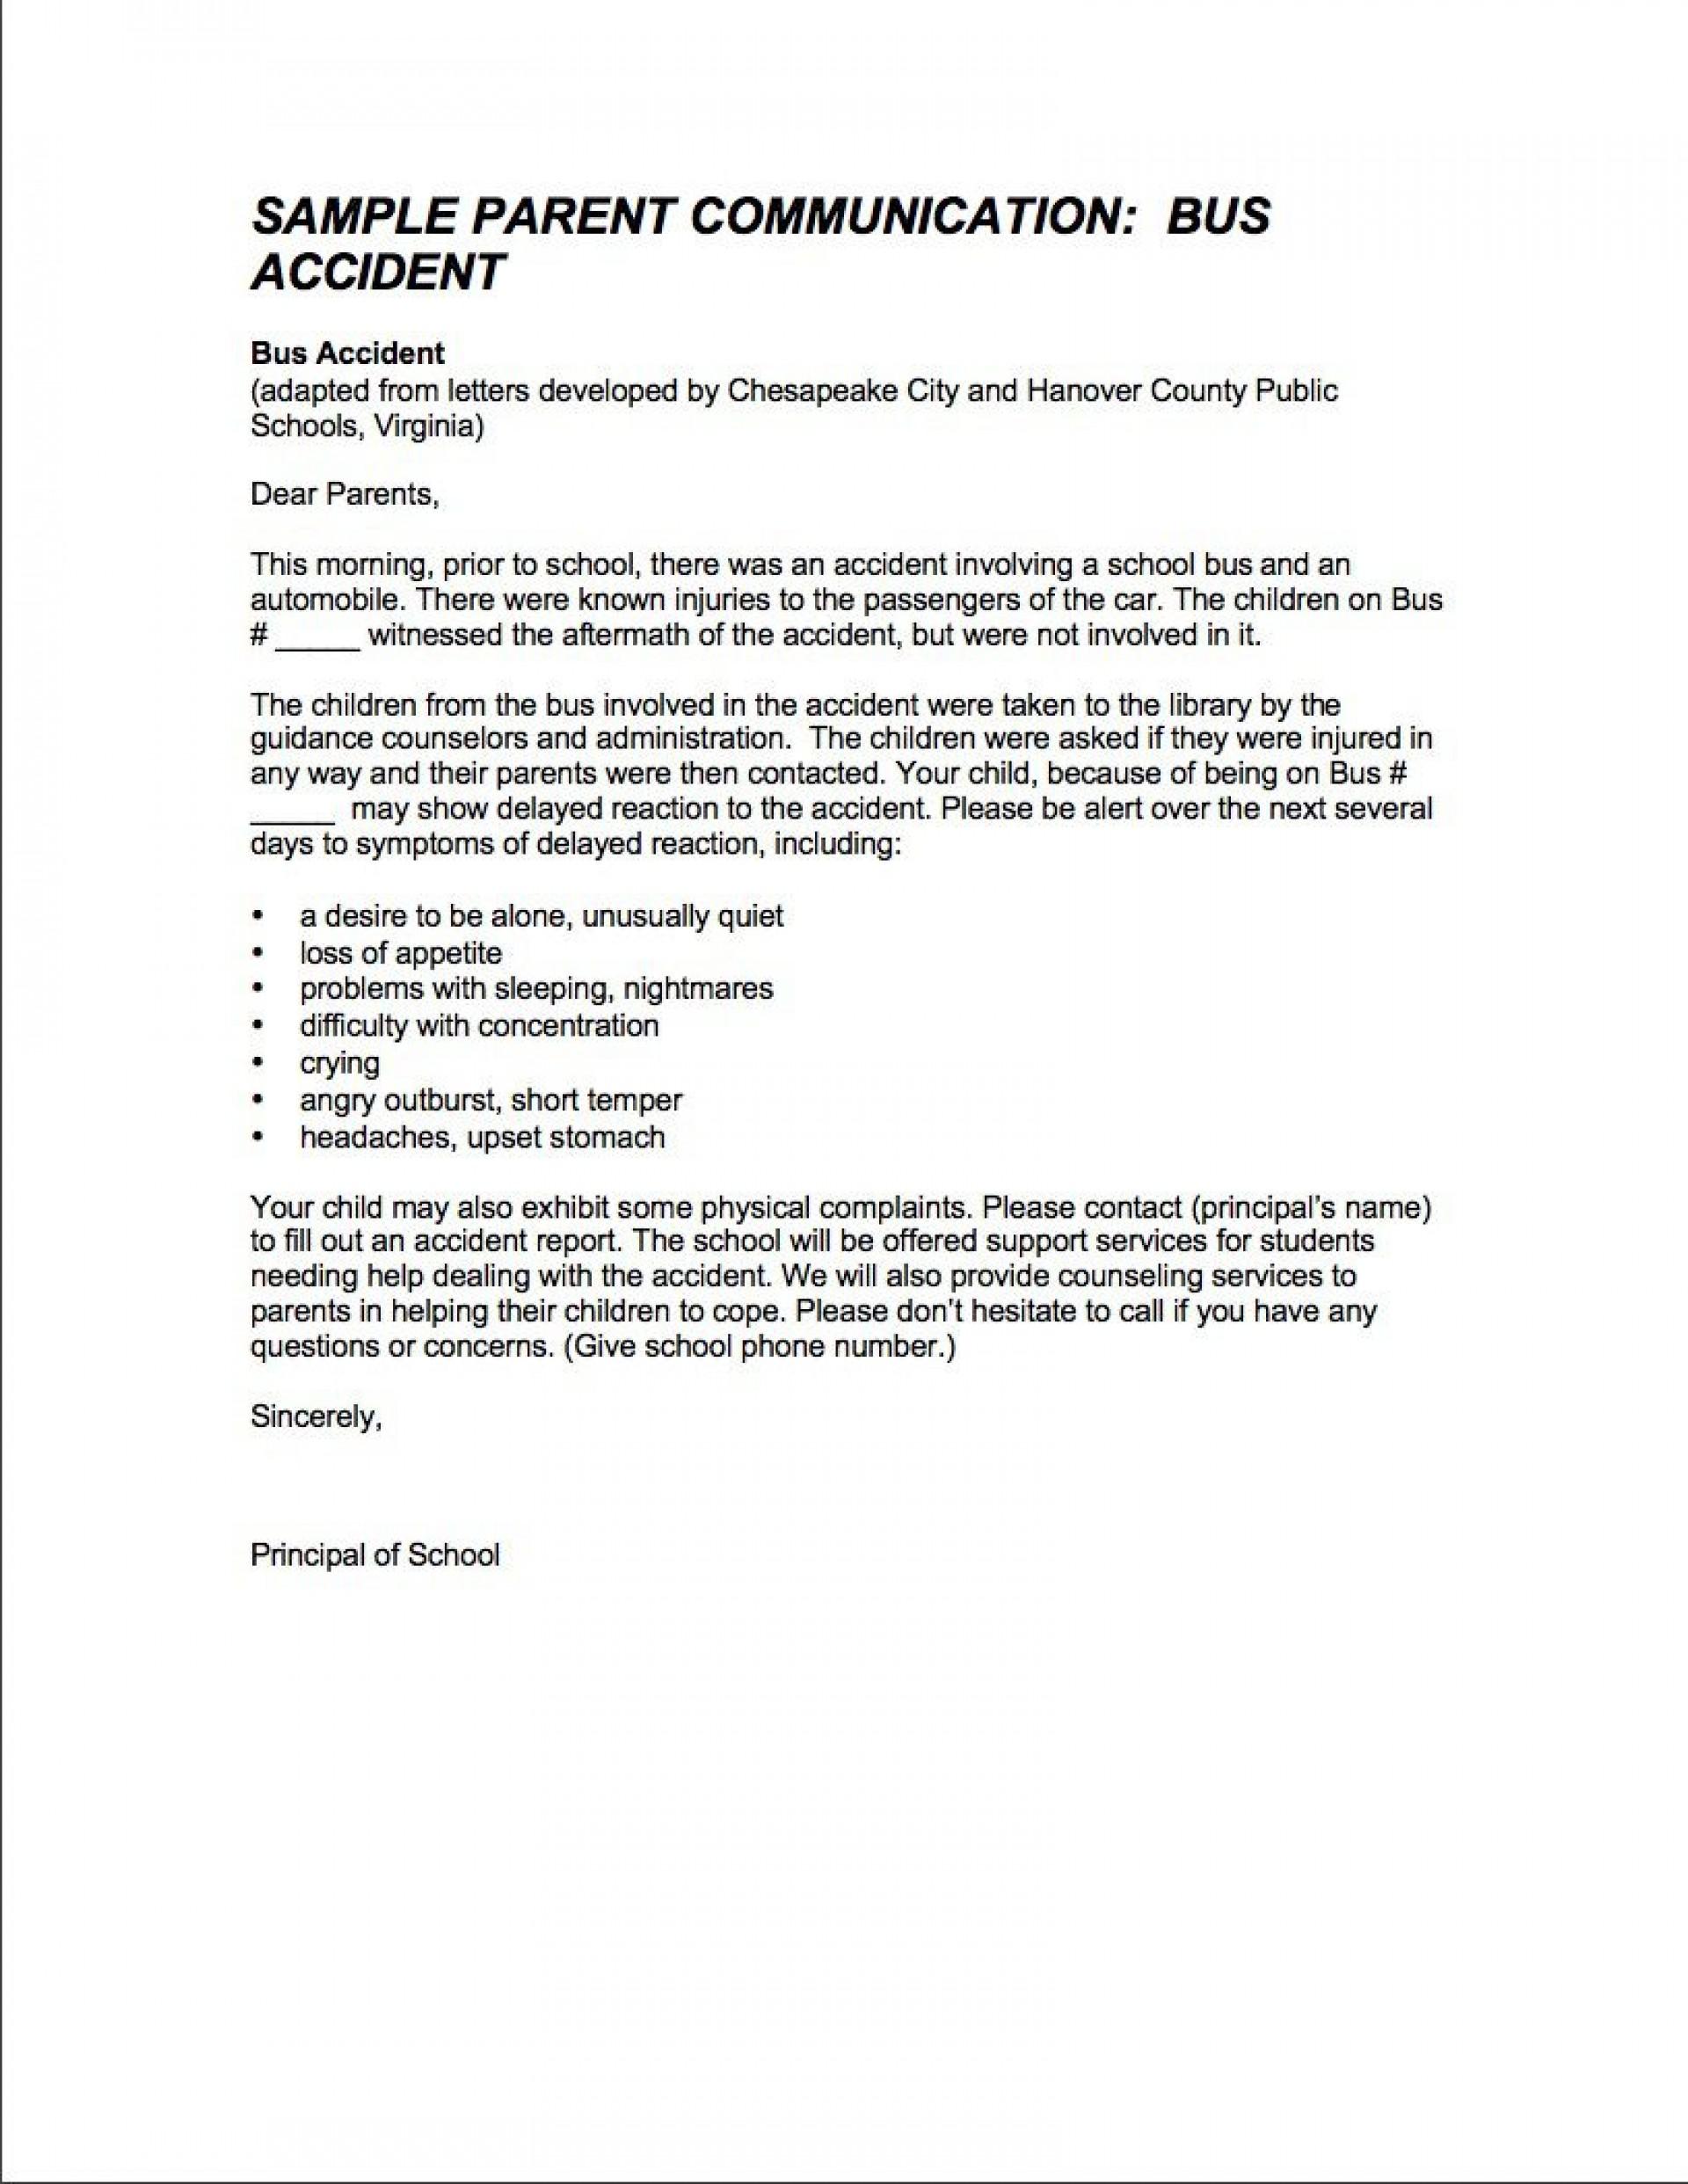 000 Impressive Crisi Communication Plan Template Photo  For Higher Education Nonprofit1920